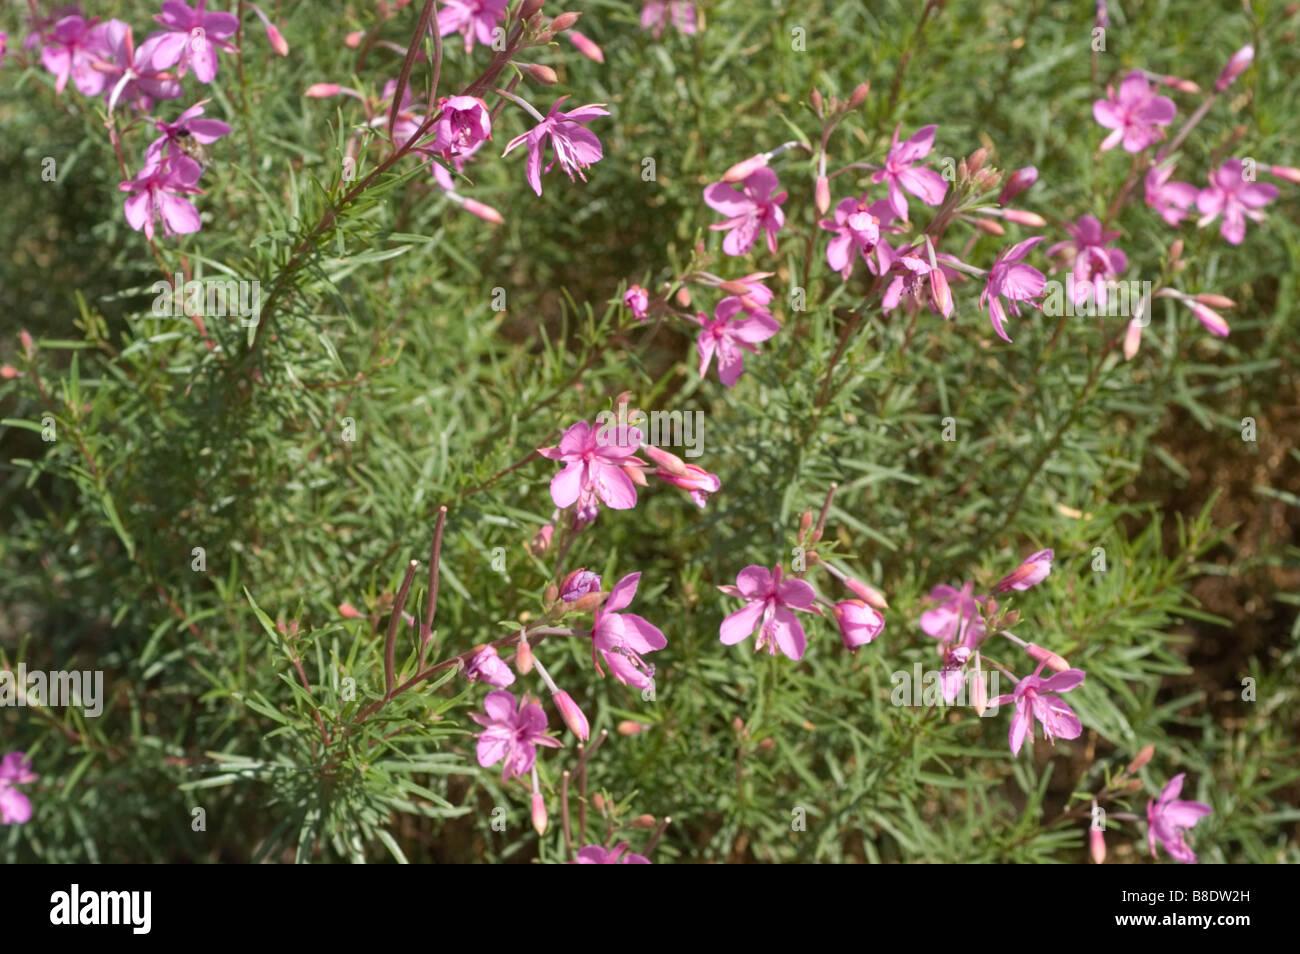 Marsh Willowherb, Onagraceae, Chamaenerion palustre, Epilobium dodonaei - Stock Image